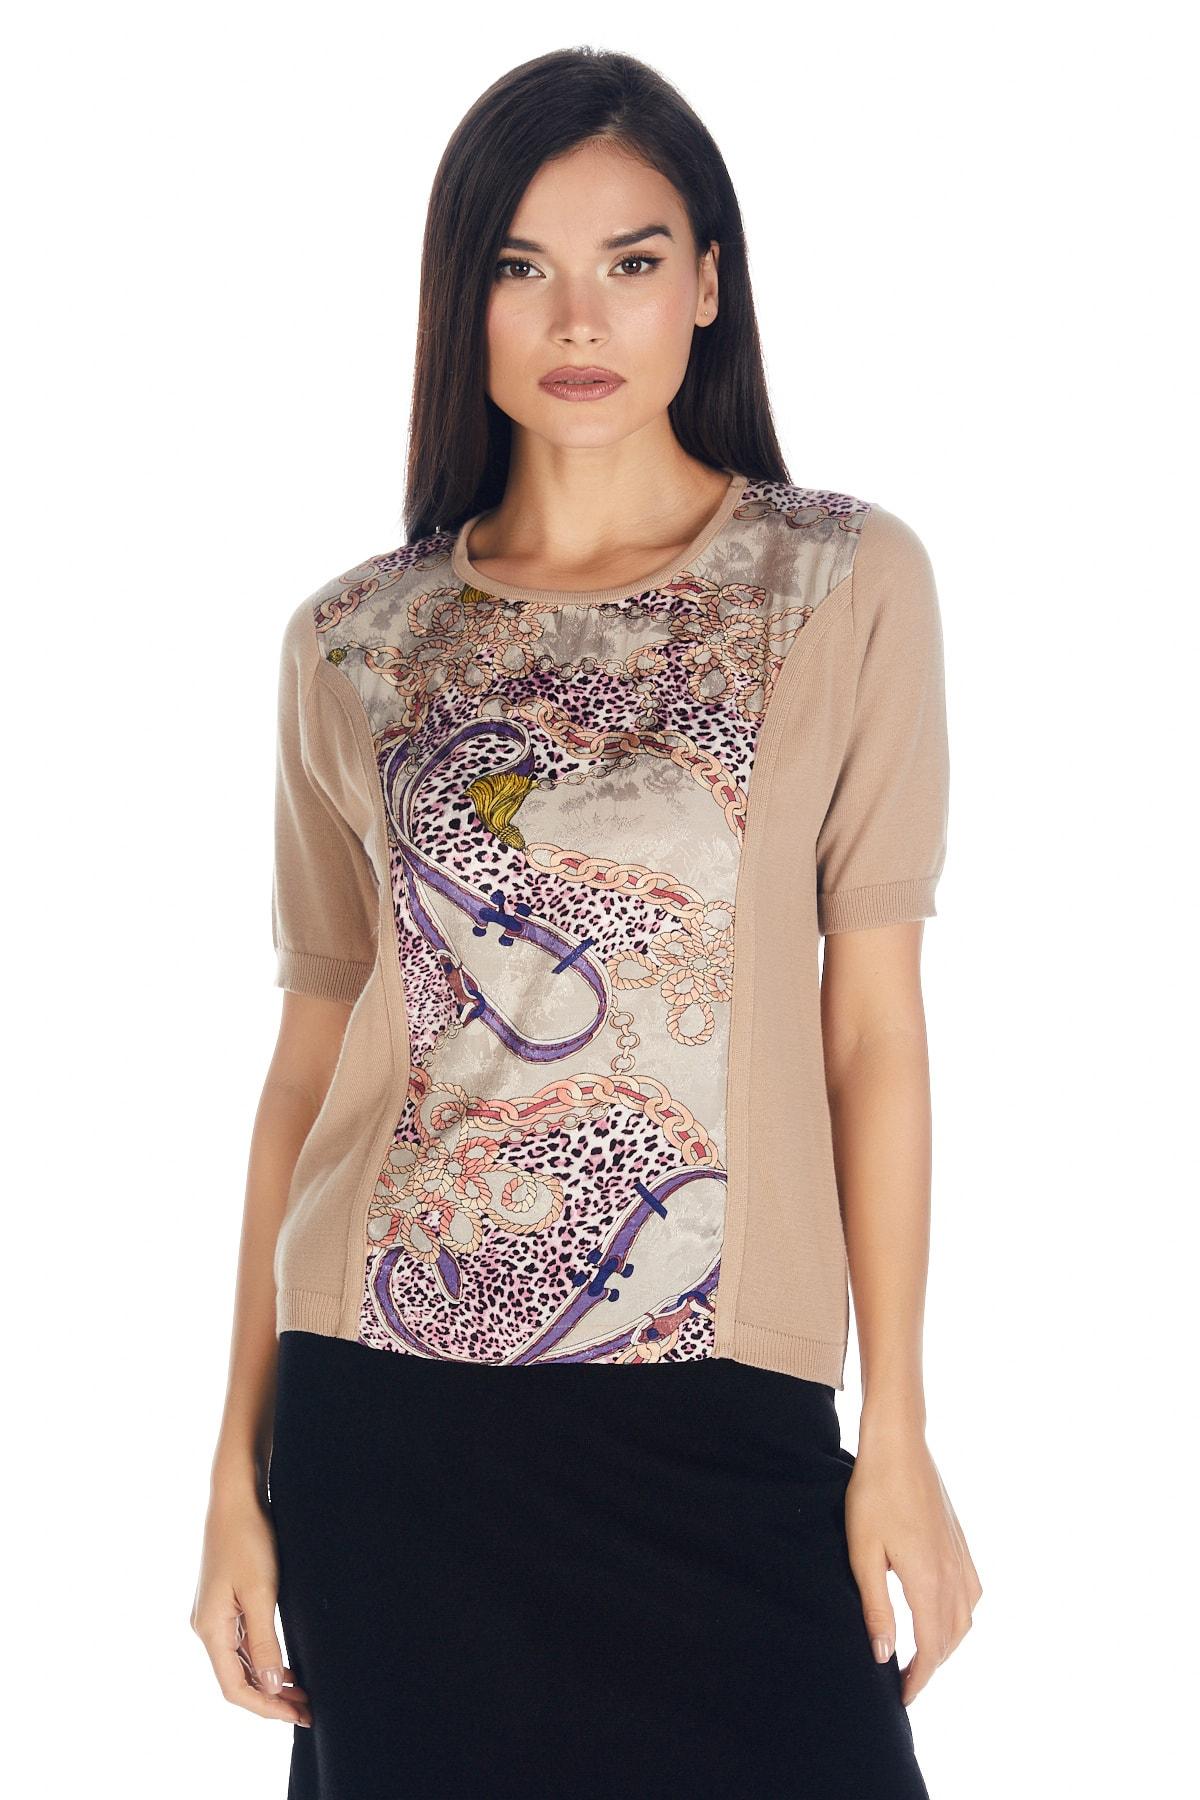 Solo Kadın Triko Japon Stil Pamuk Rayon Lüks Bluz 1